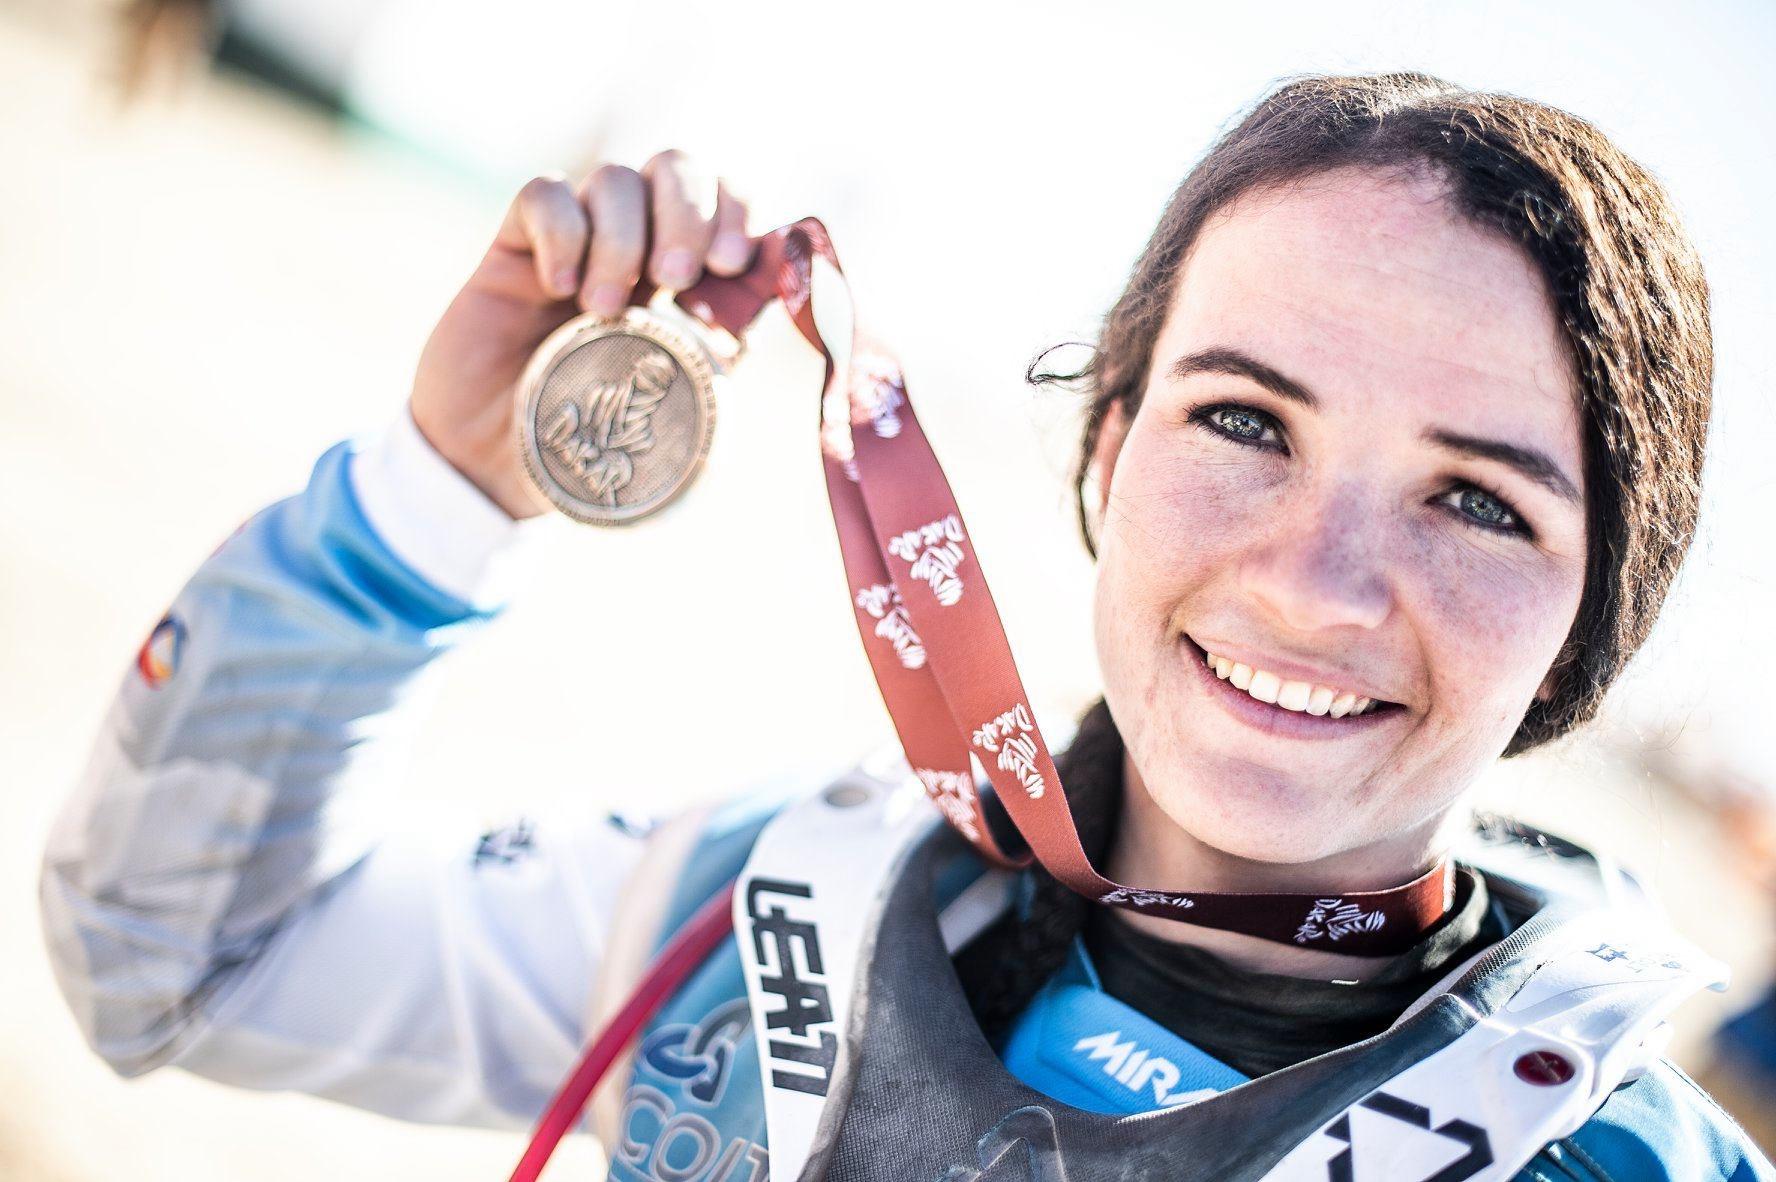 Dakar Medal Taye Perry